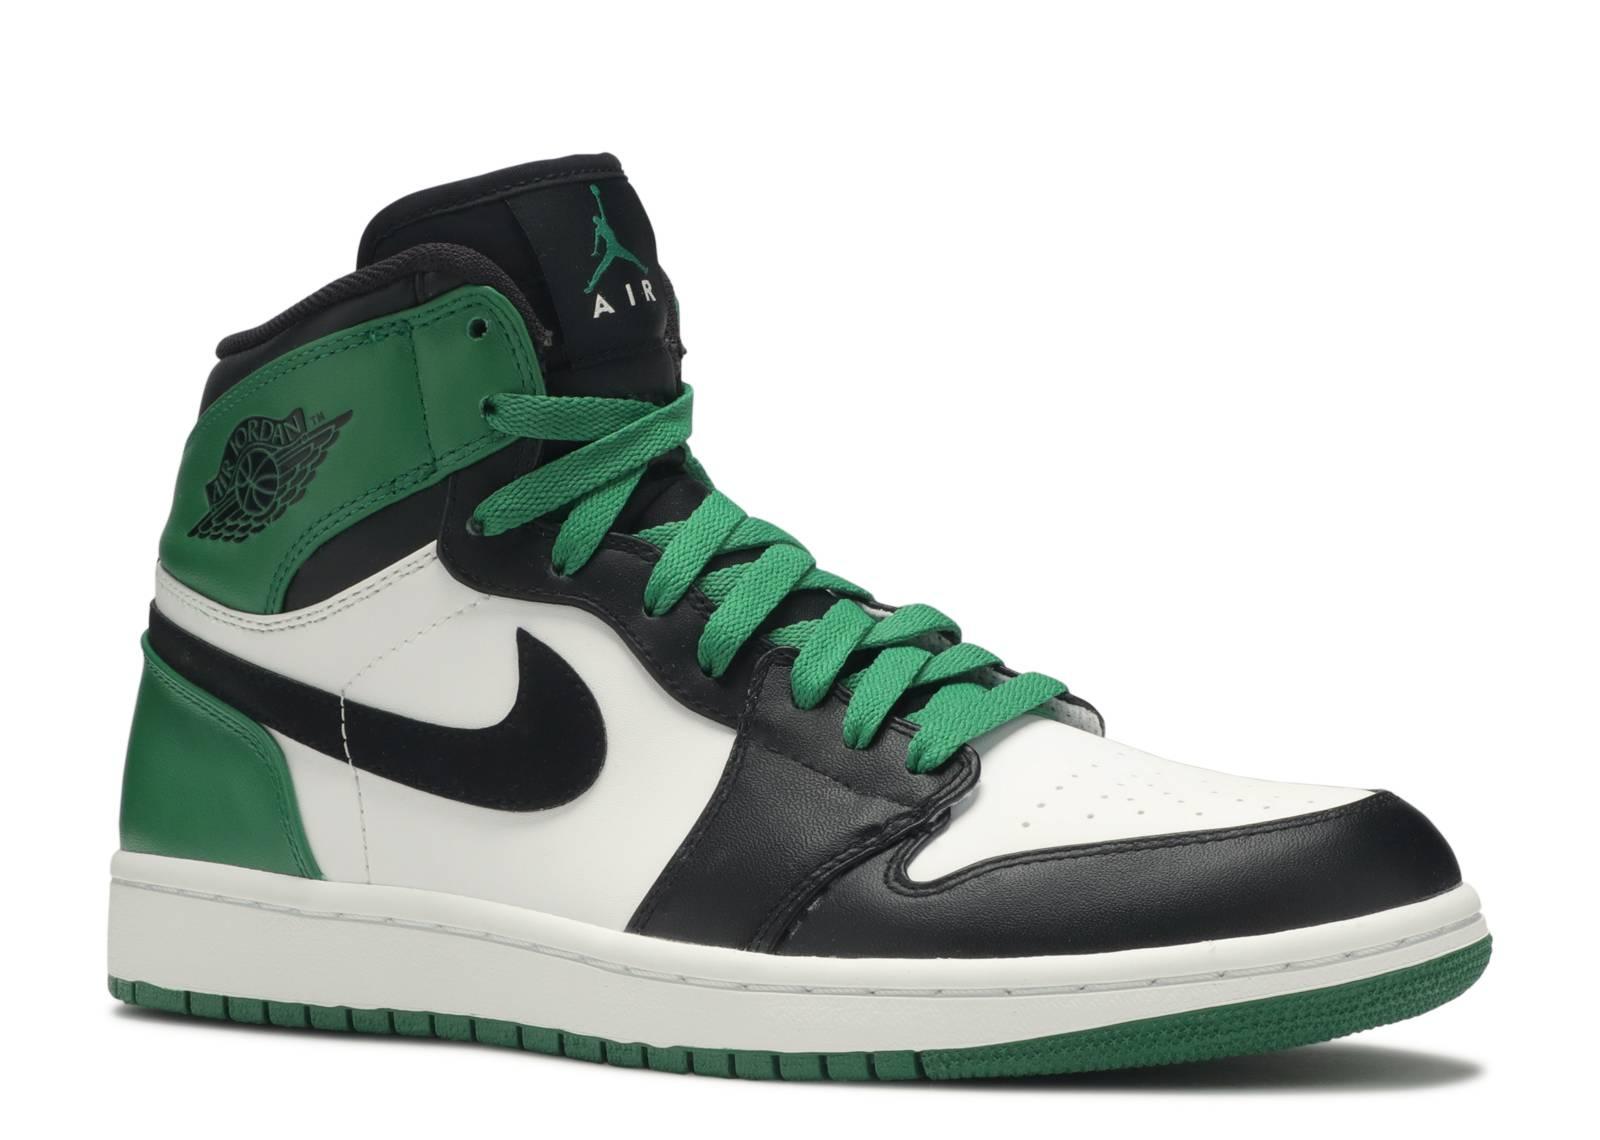 Green Air Jordan Basketball Shoes